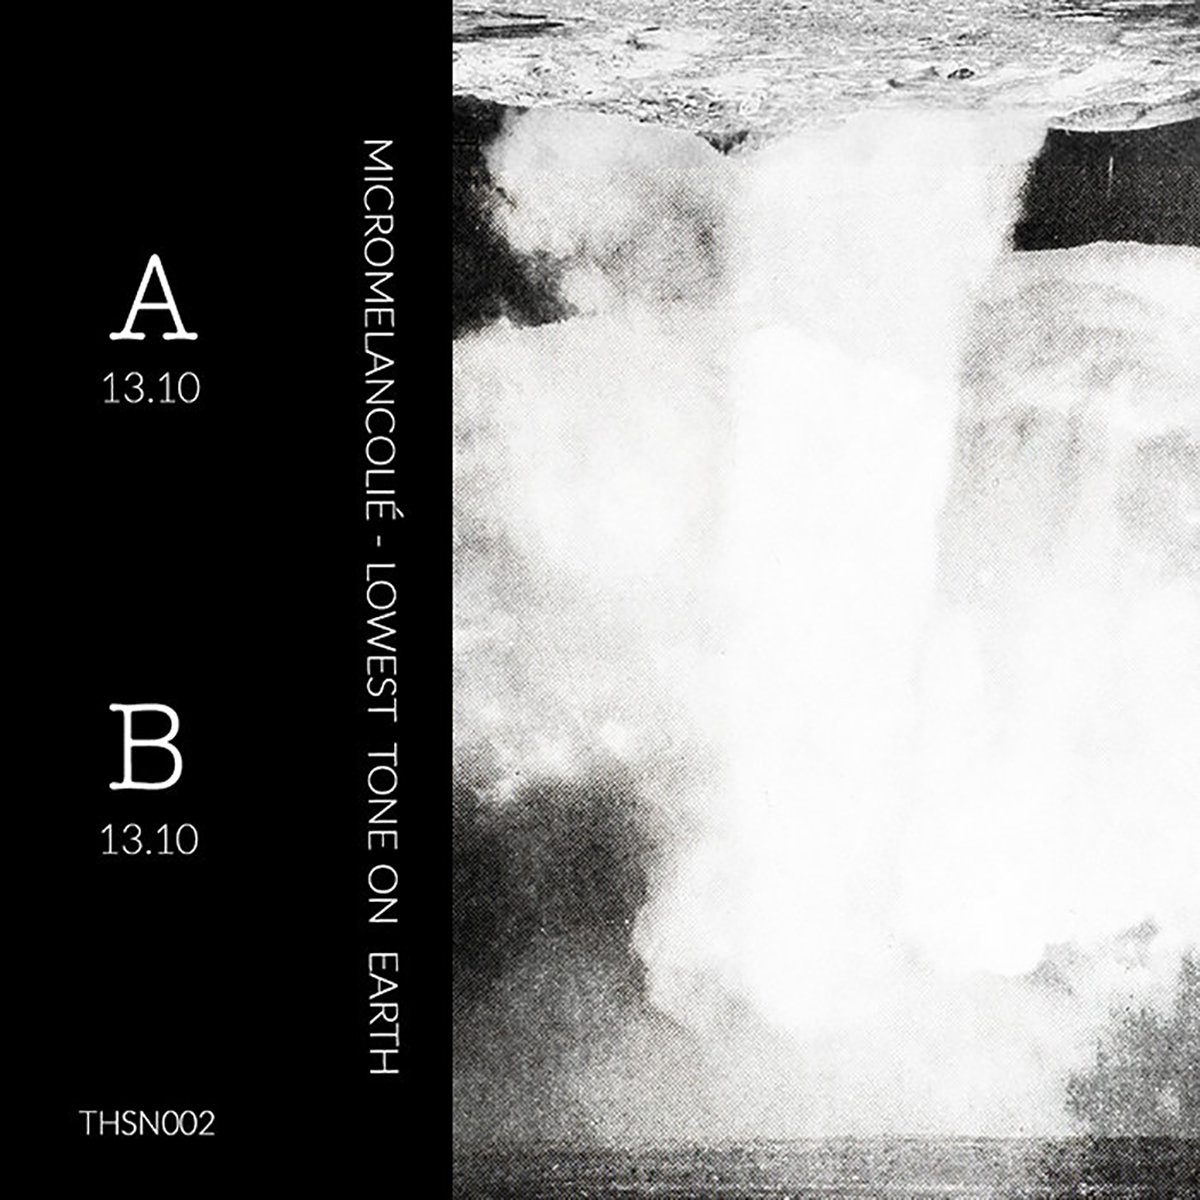 explosion tone mp3 download